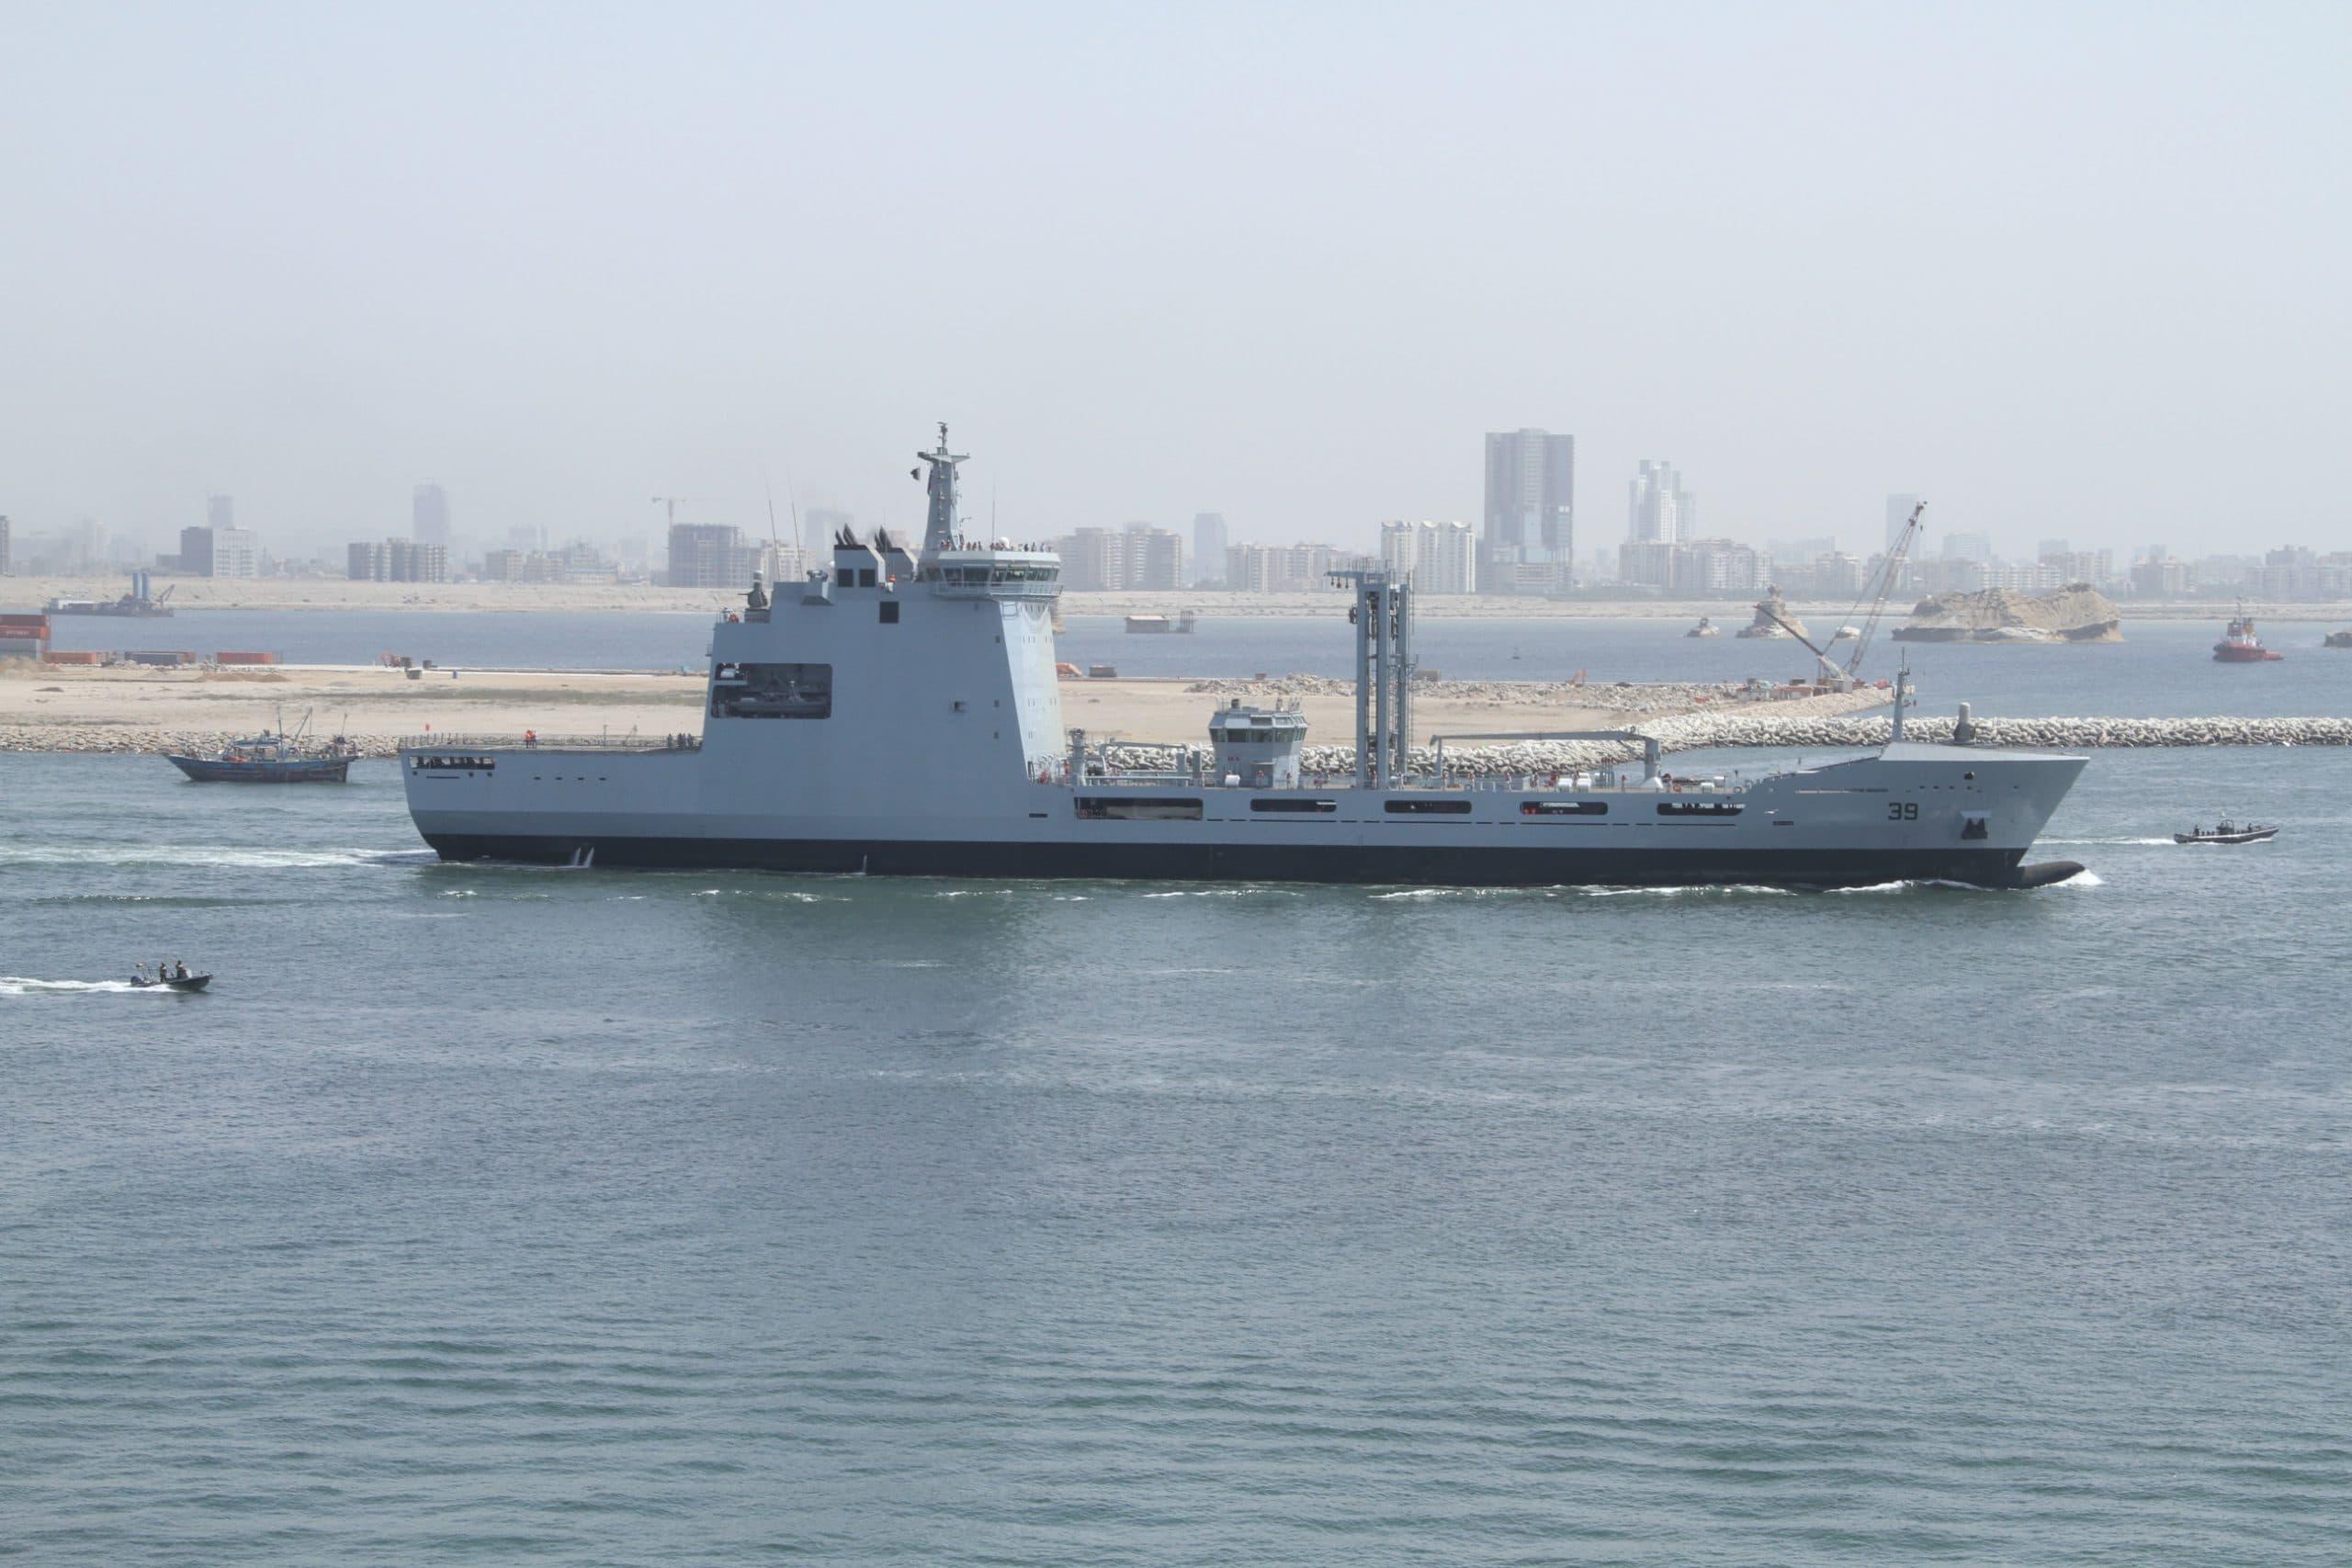 Supply Tanker for Pakistani Navy 89